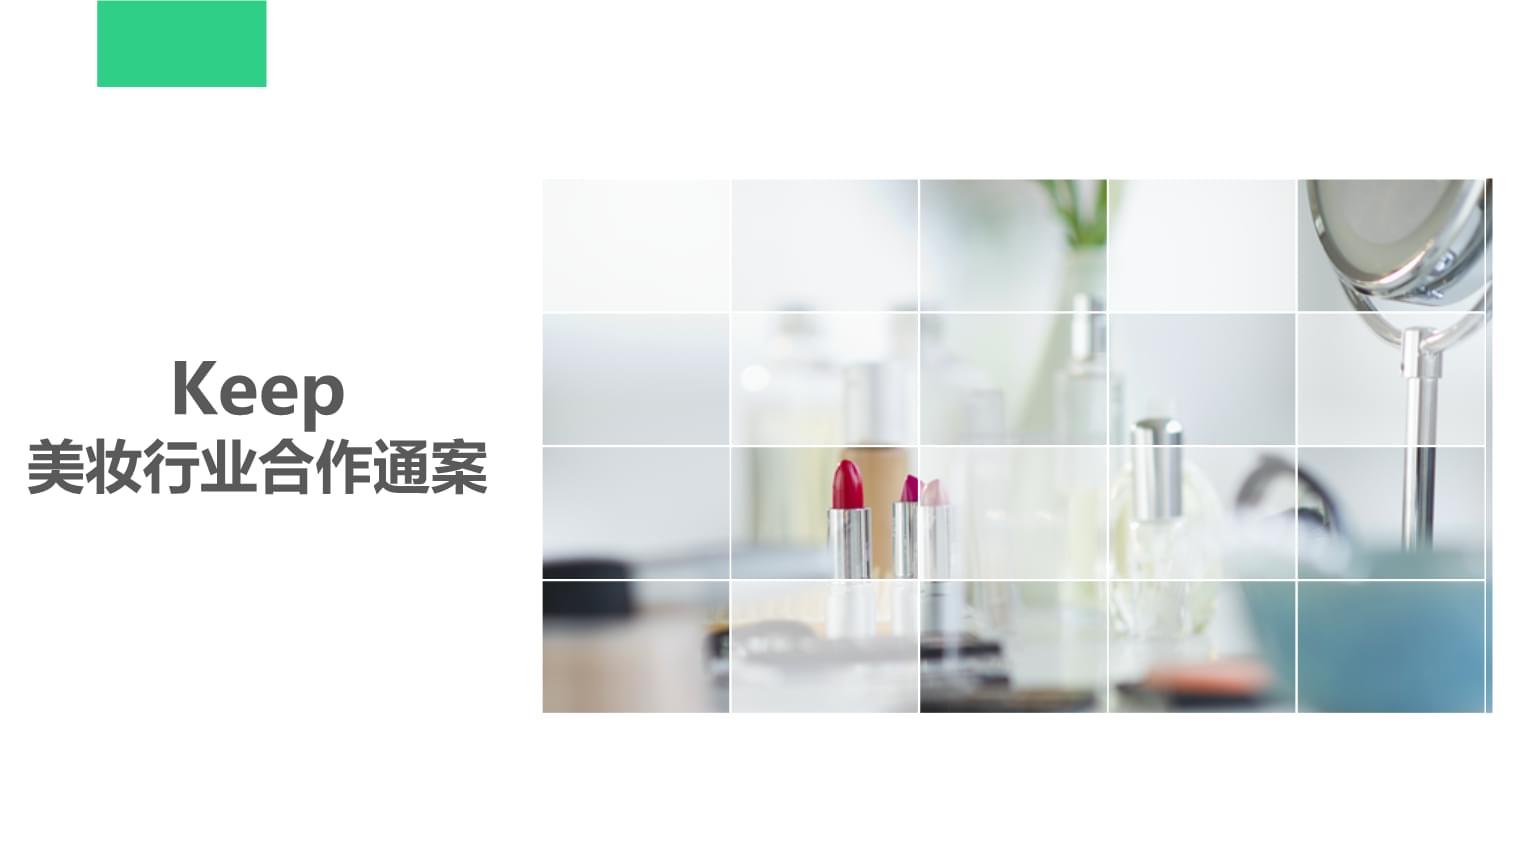 2019keep美妆行业合作通案【体育】【跨界营销】.pptx